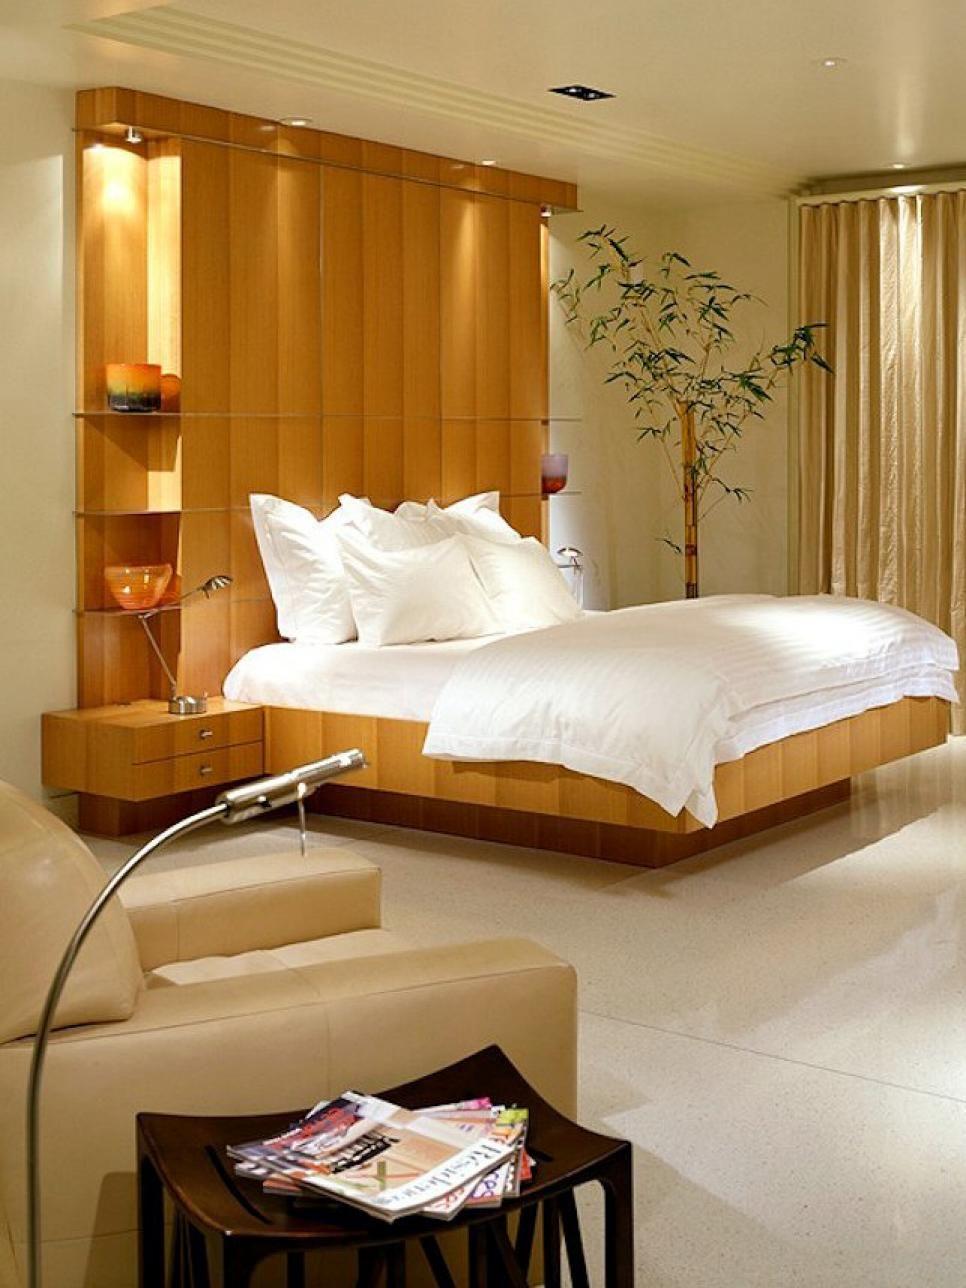 bedroom wall unit headboard. Headboards That Make The Room Bedroom Wall Unit Headboard S